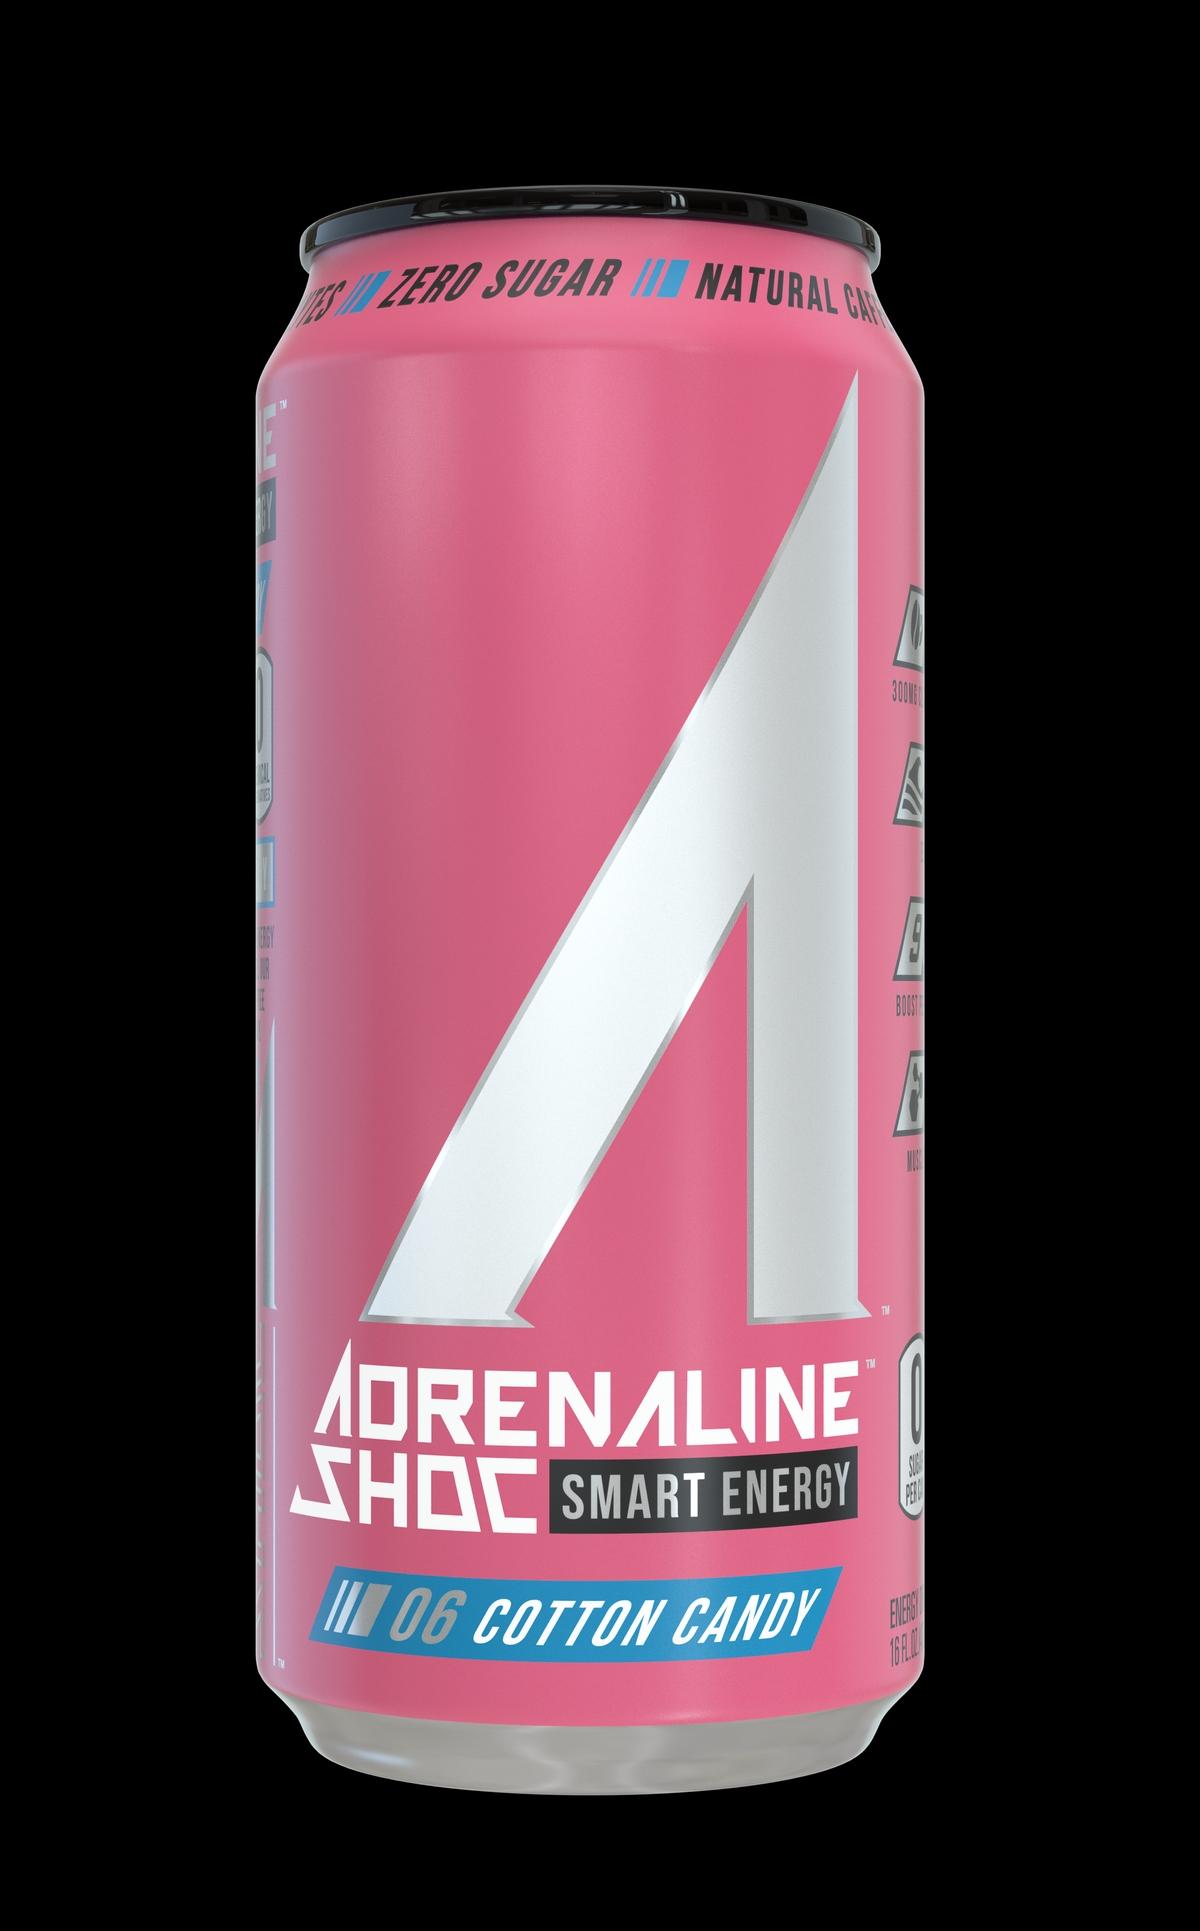 Adrenaline Shoc [ Smart Energy ] : Cotton Candy